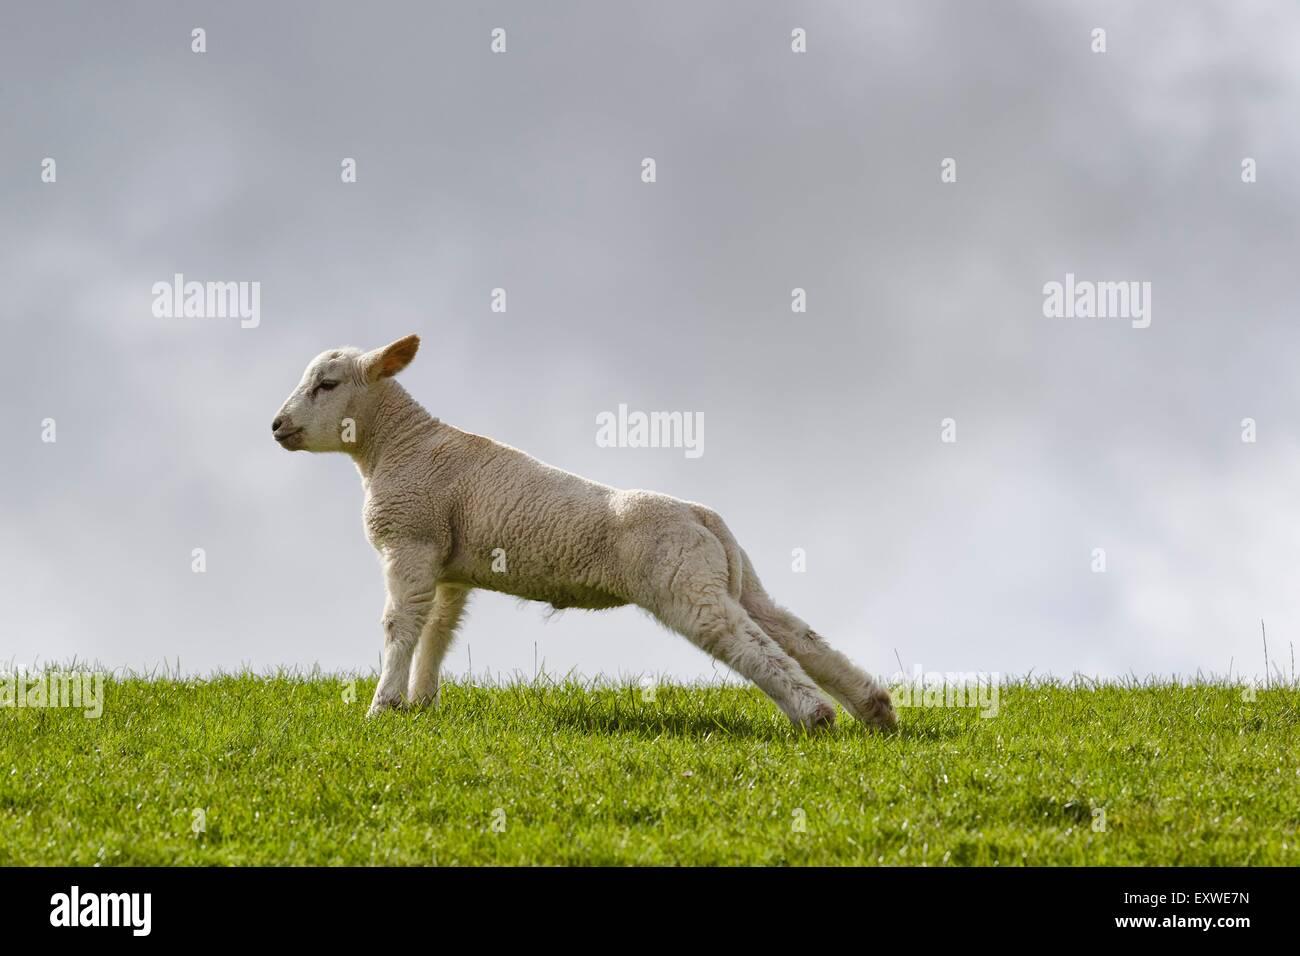 Lamb stretching on dyke Stock Photo